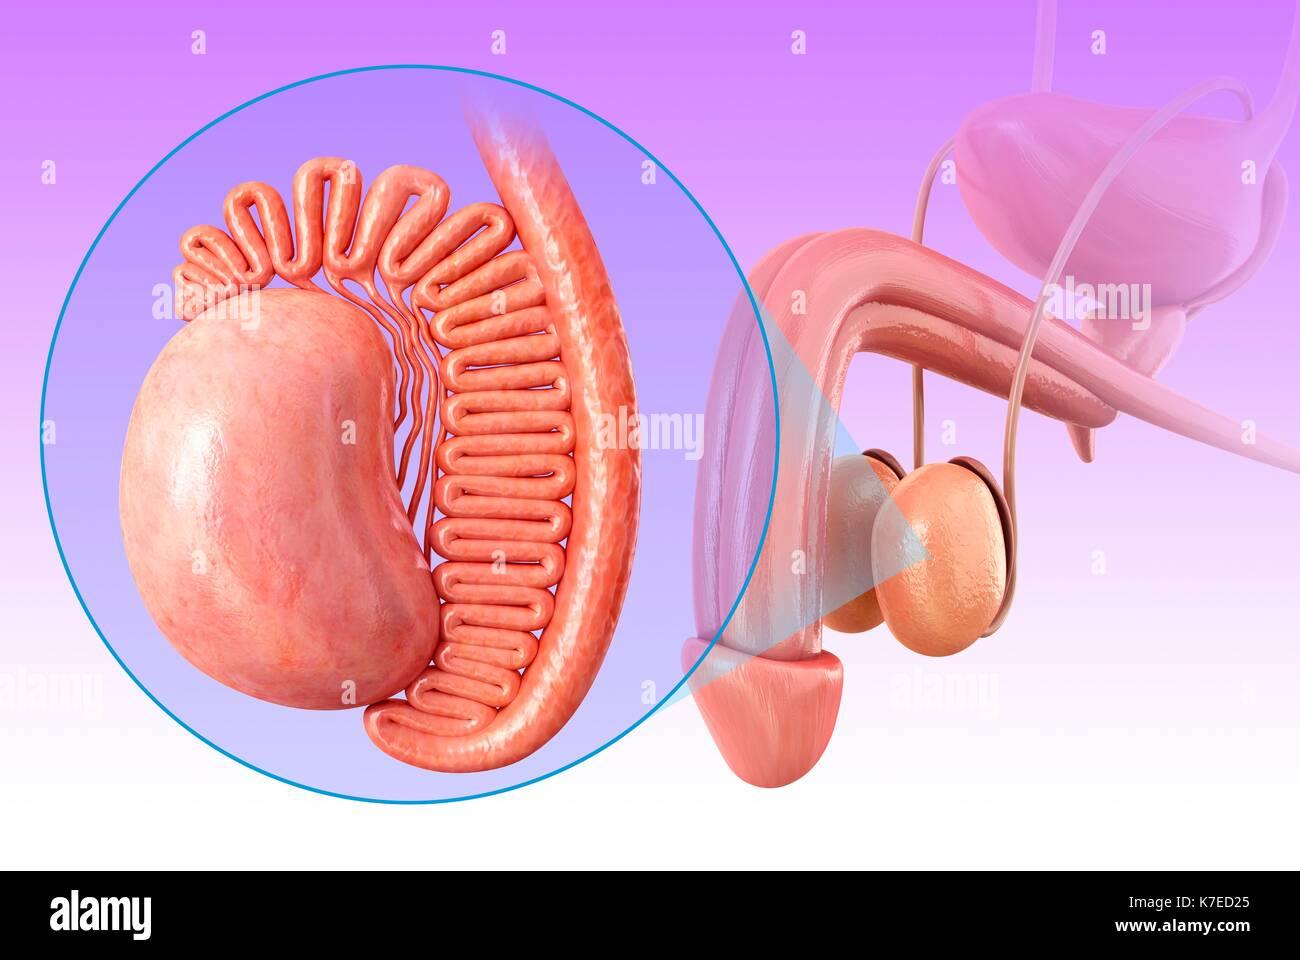 Illustration of male testis anatomy Stock Photo: 159513485 - Alamy